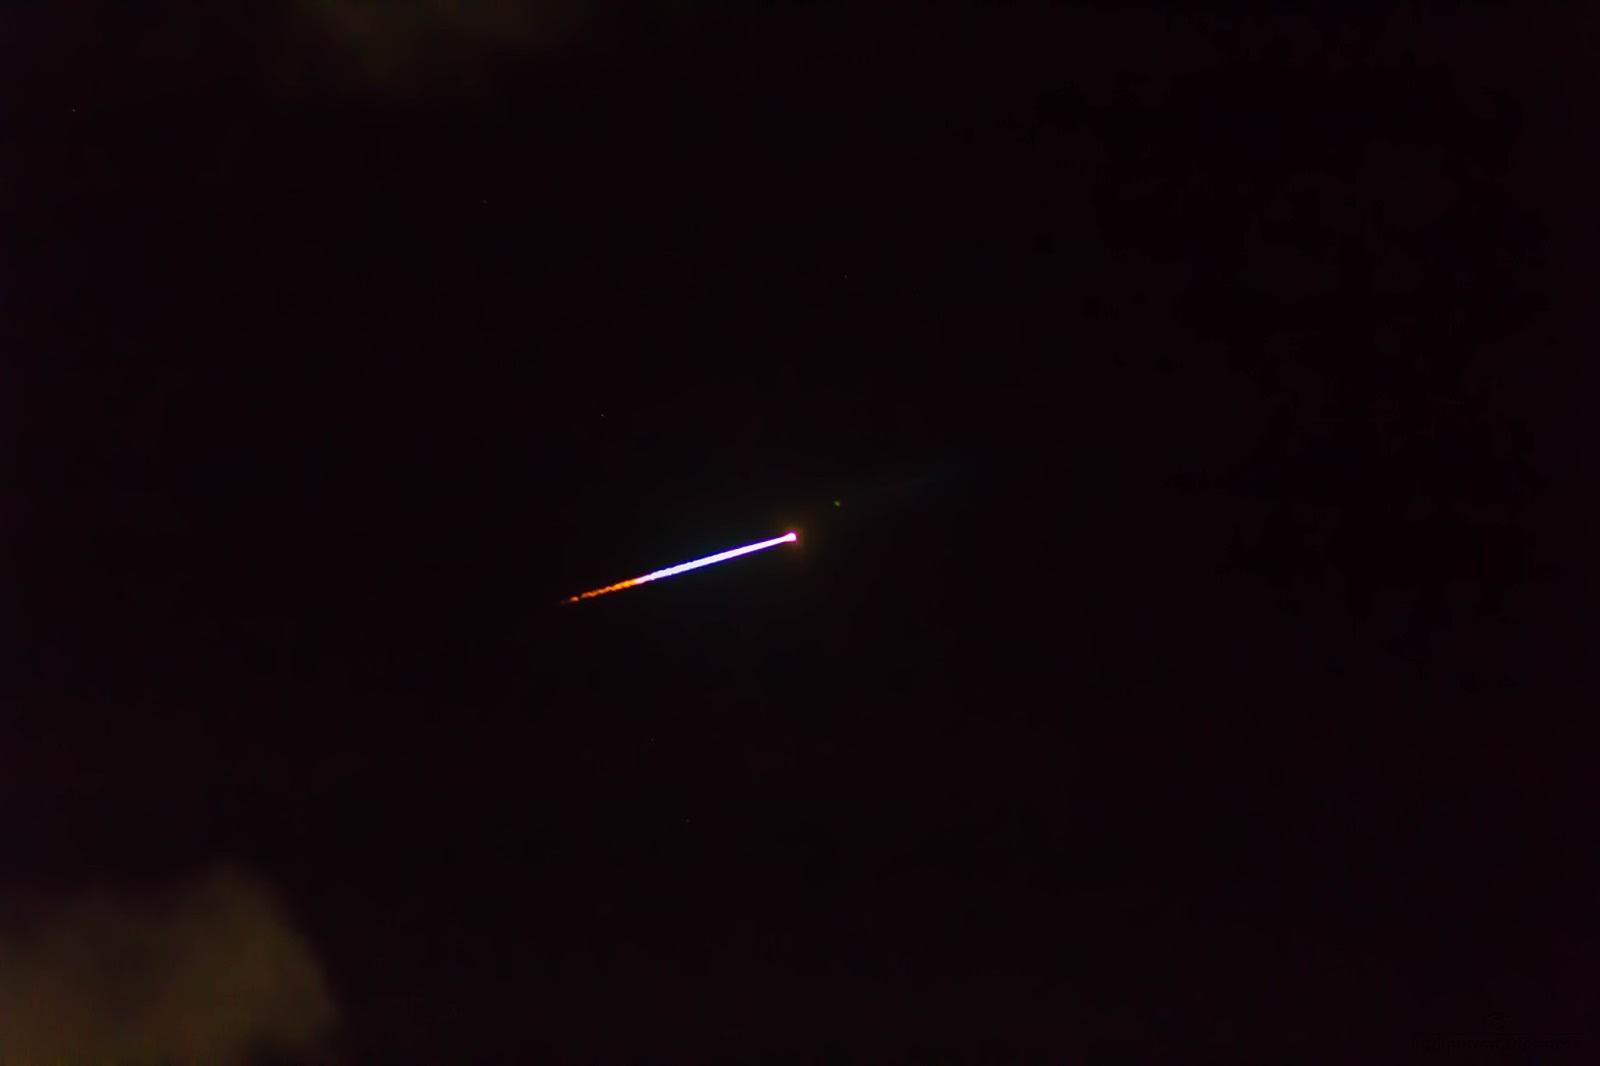 Image 2 - Meteor - Chennai, India, 16.October.2014 1.36 am IST